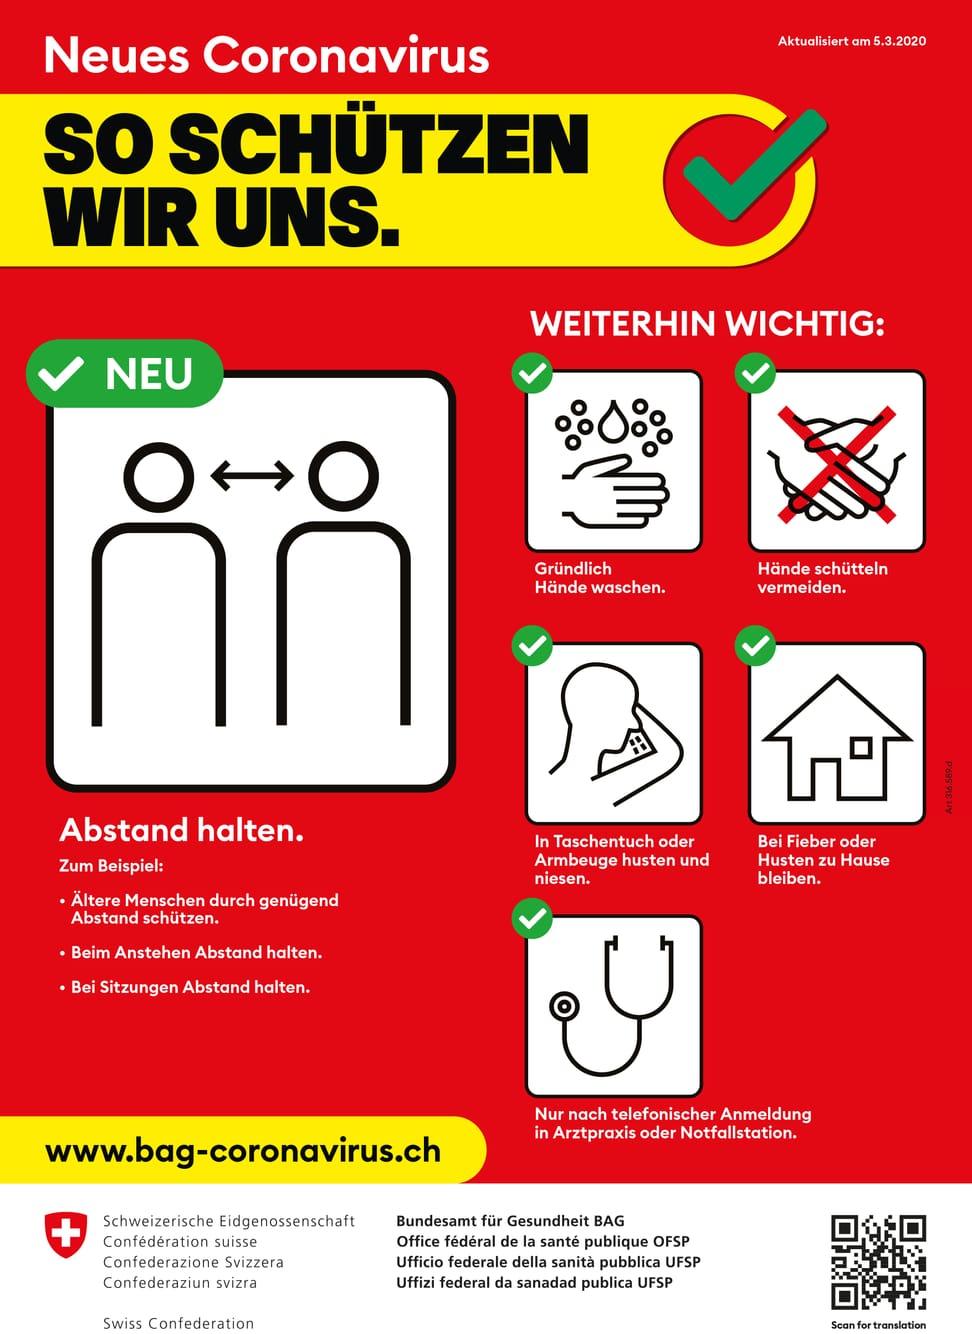 BAG Plakat Coronavirus